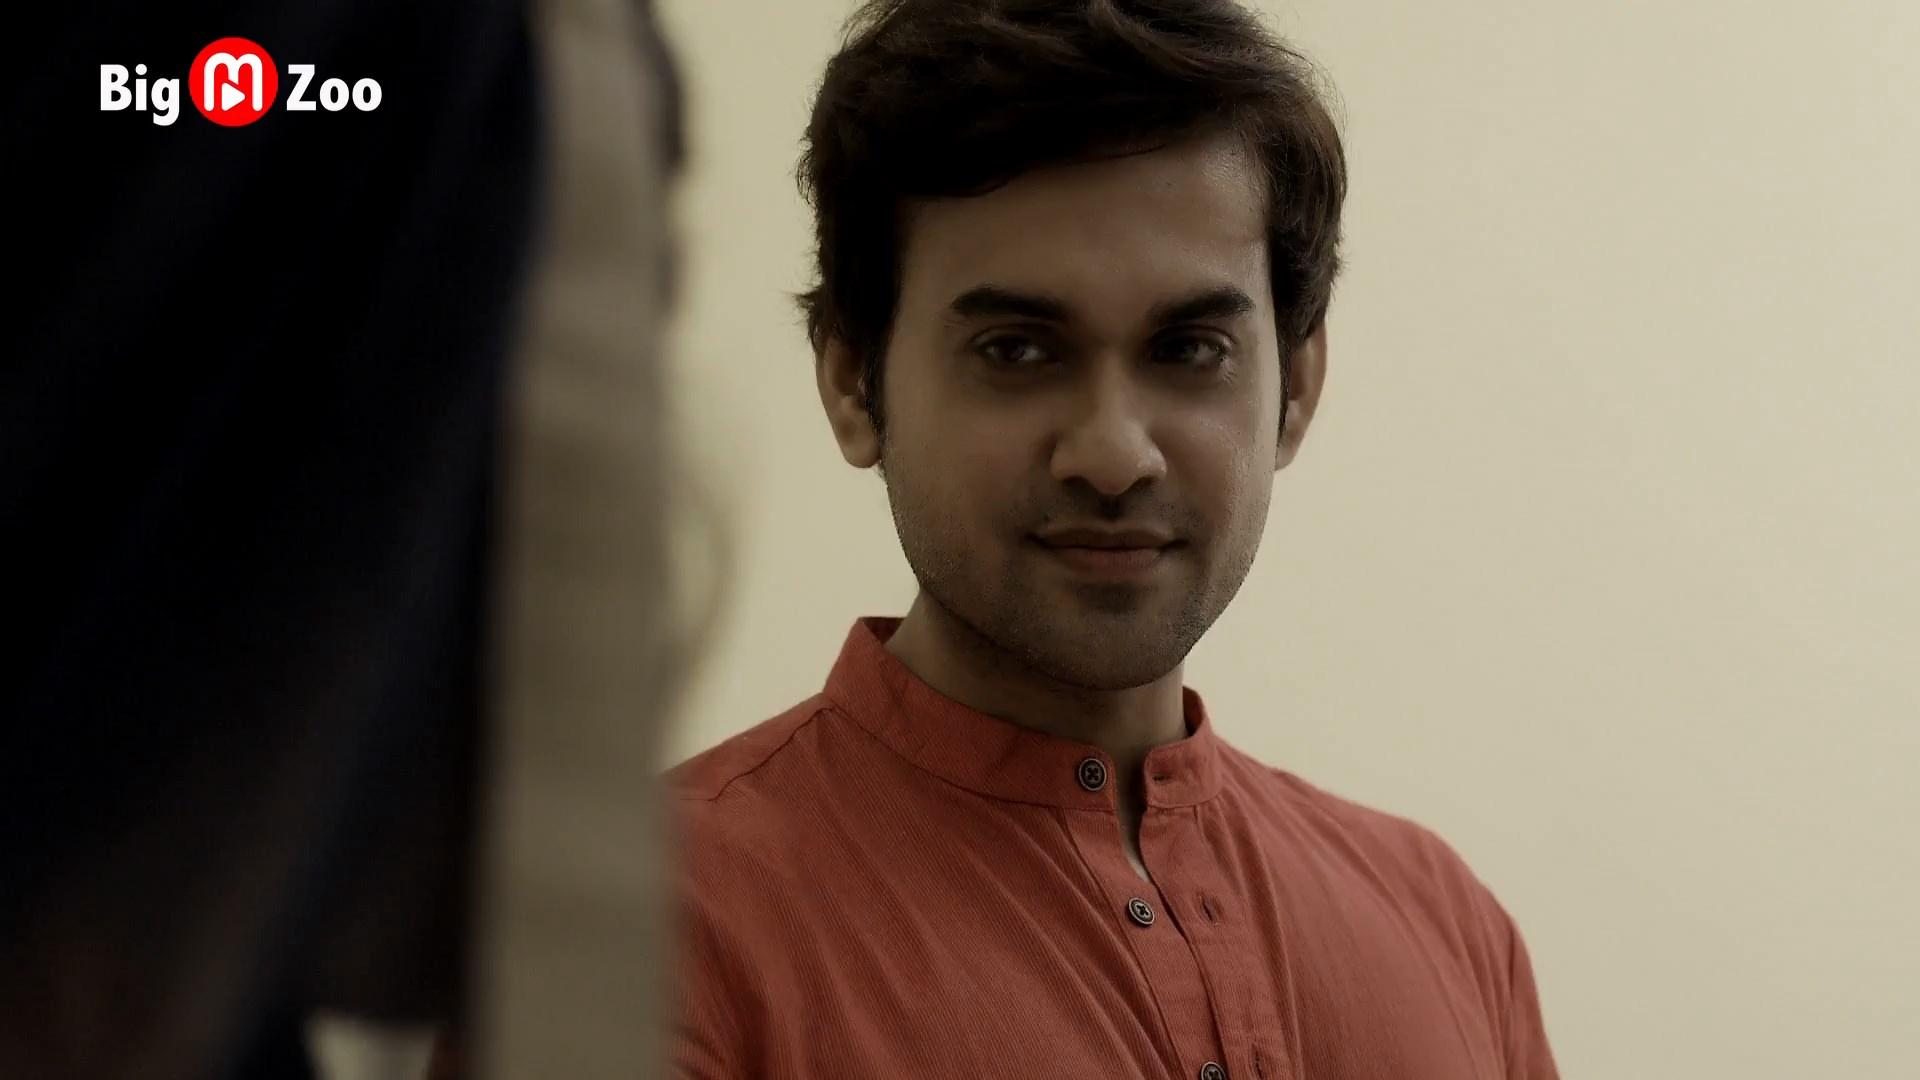 rh 3 - 18+ Rooh 2020 Big Movie Zoo App Originals Hindi Short Film 720p HDRip 70MB x264 AAC